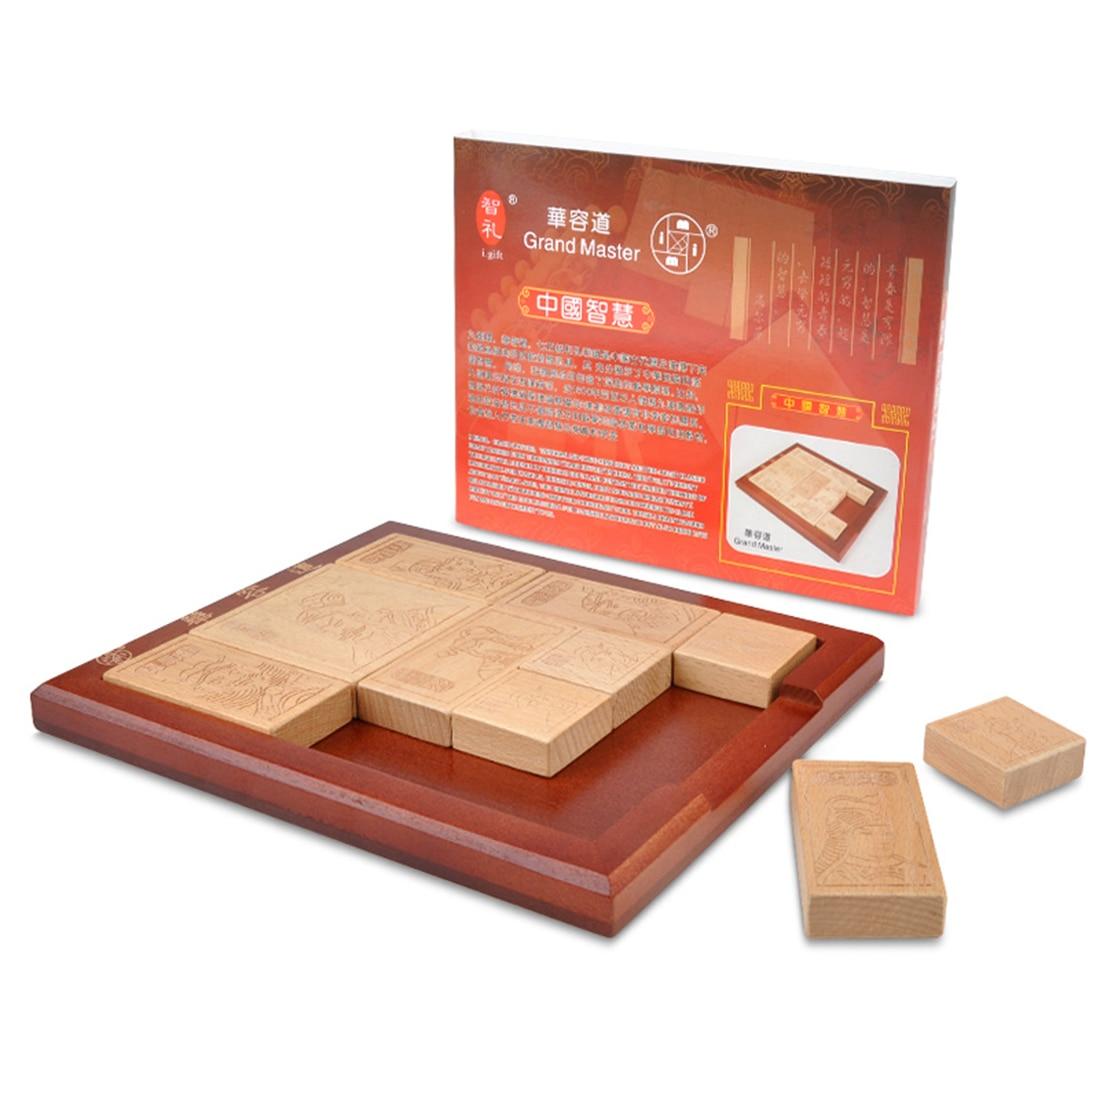 us $31.19 22% off|classic chinese wooden game toy huarong dao path klotski  sliding puzzle brain teaser educational development toy w puzzle od zabawki